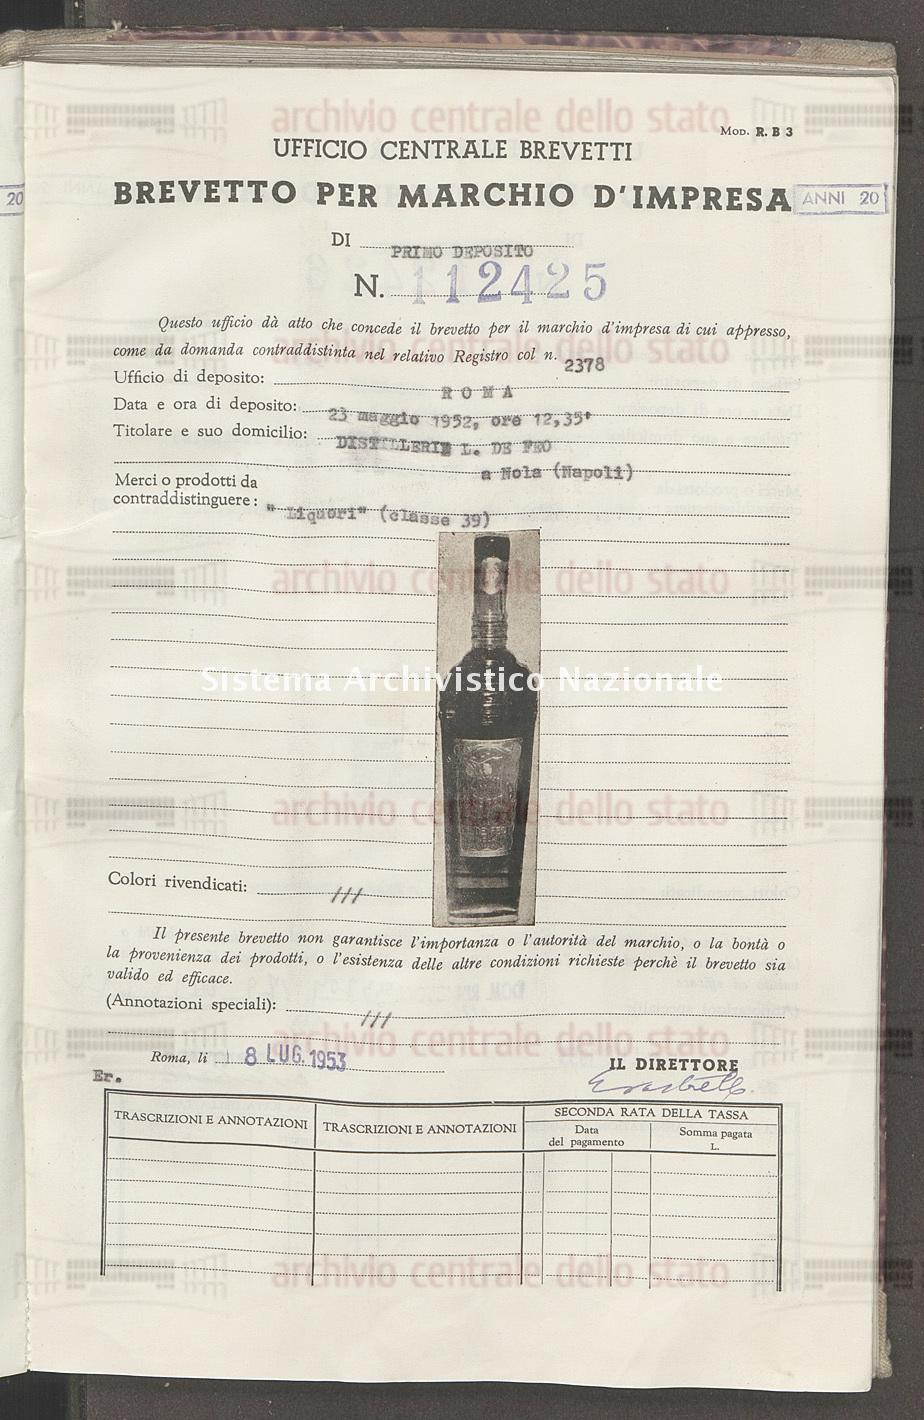 'Liquori' Distillerie L. De Feo (08/07/1953)